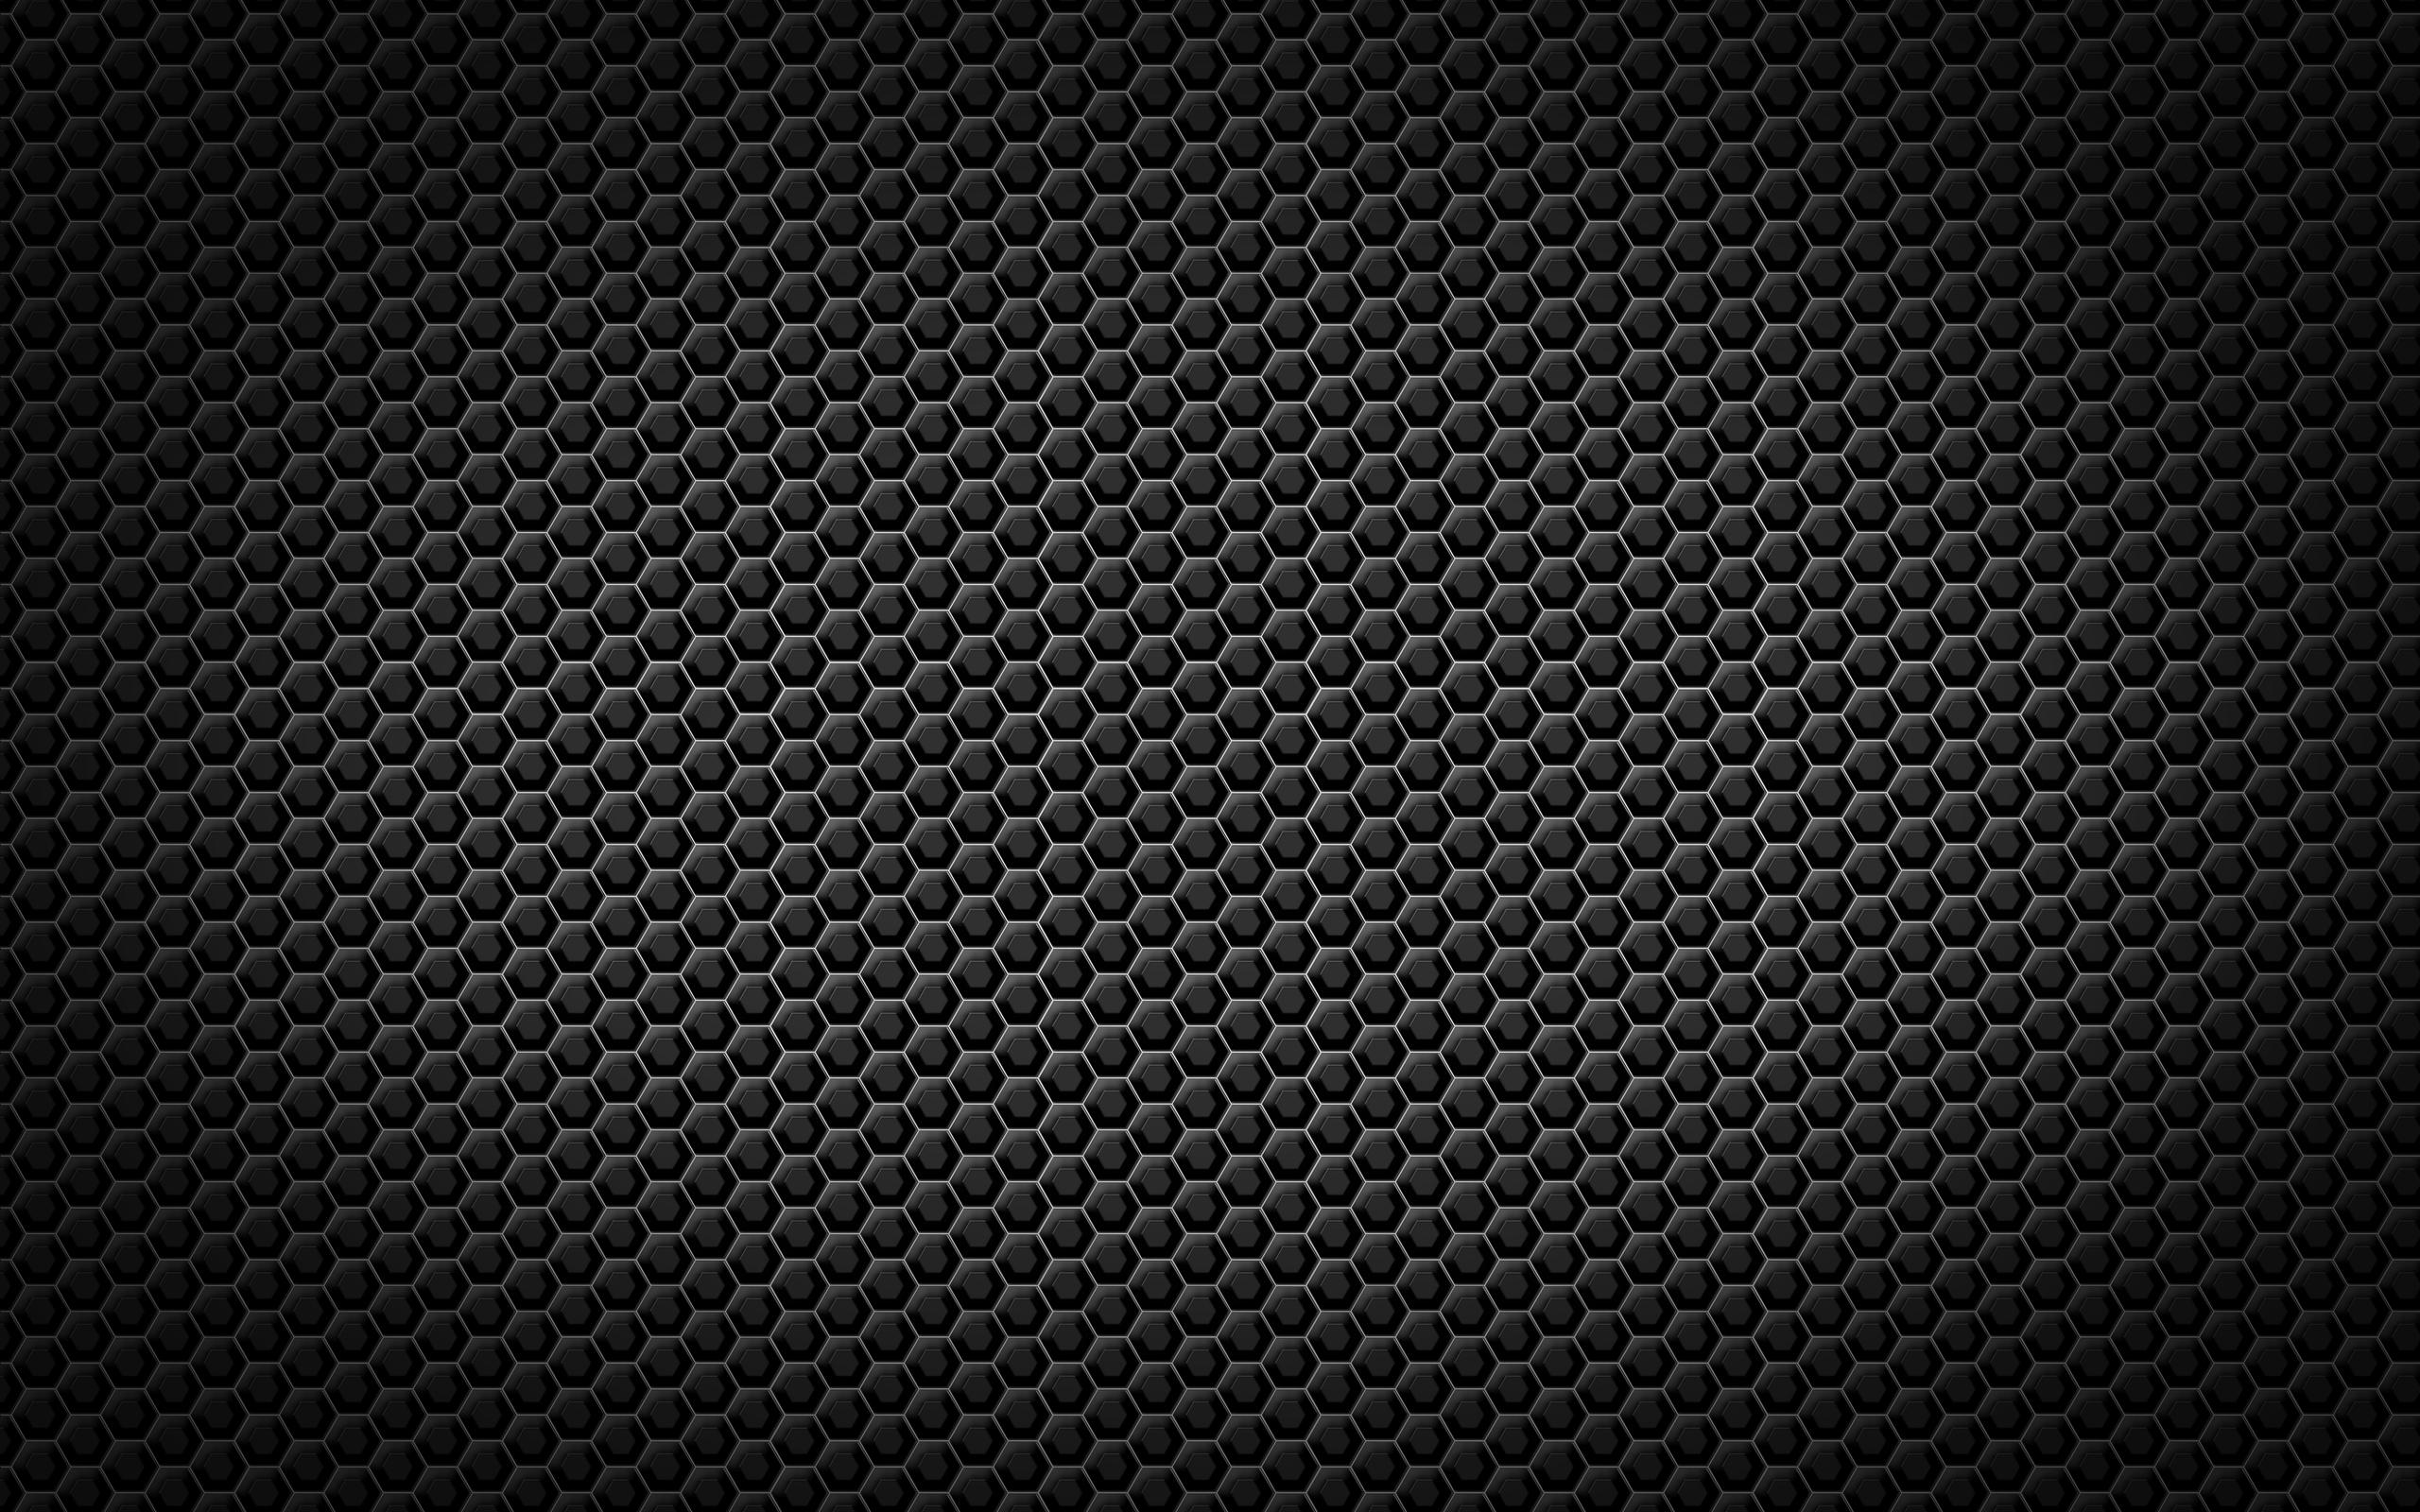 Black Cool Background 2560x1600